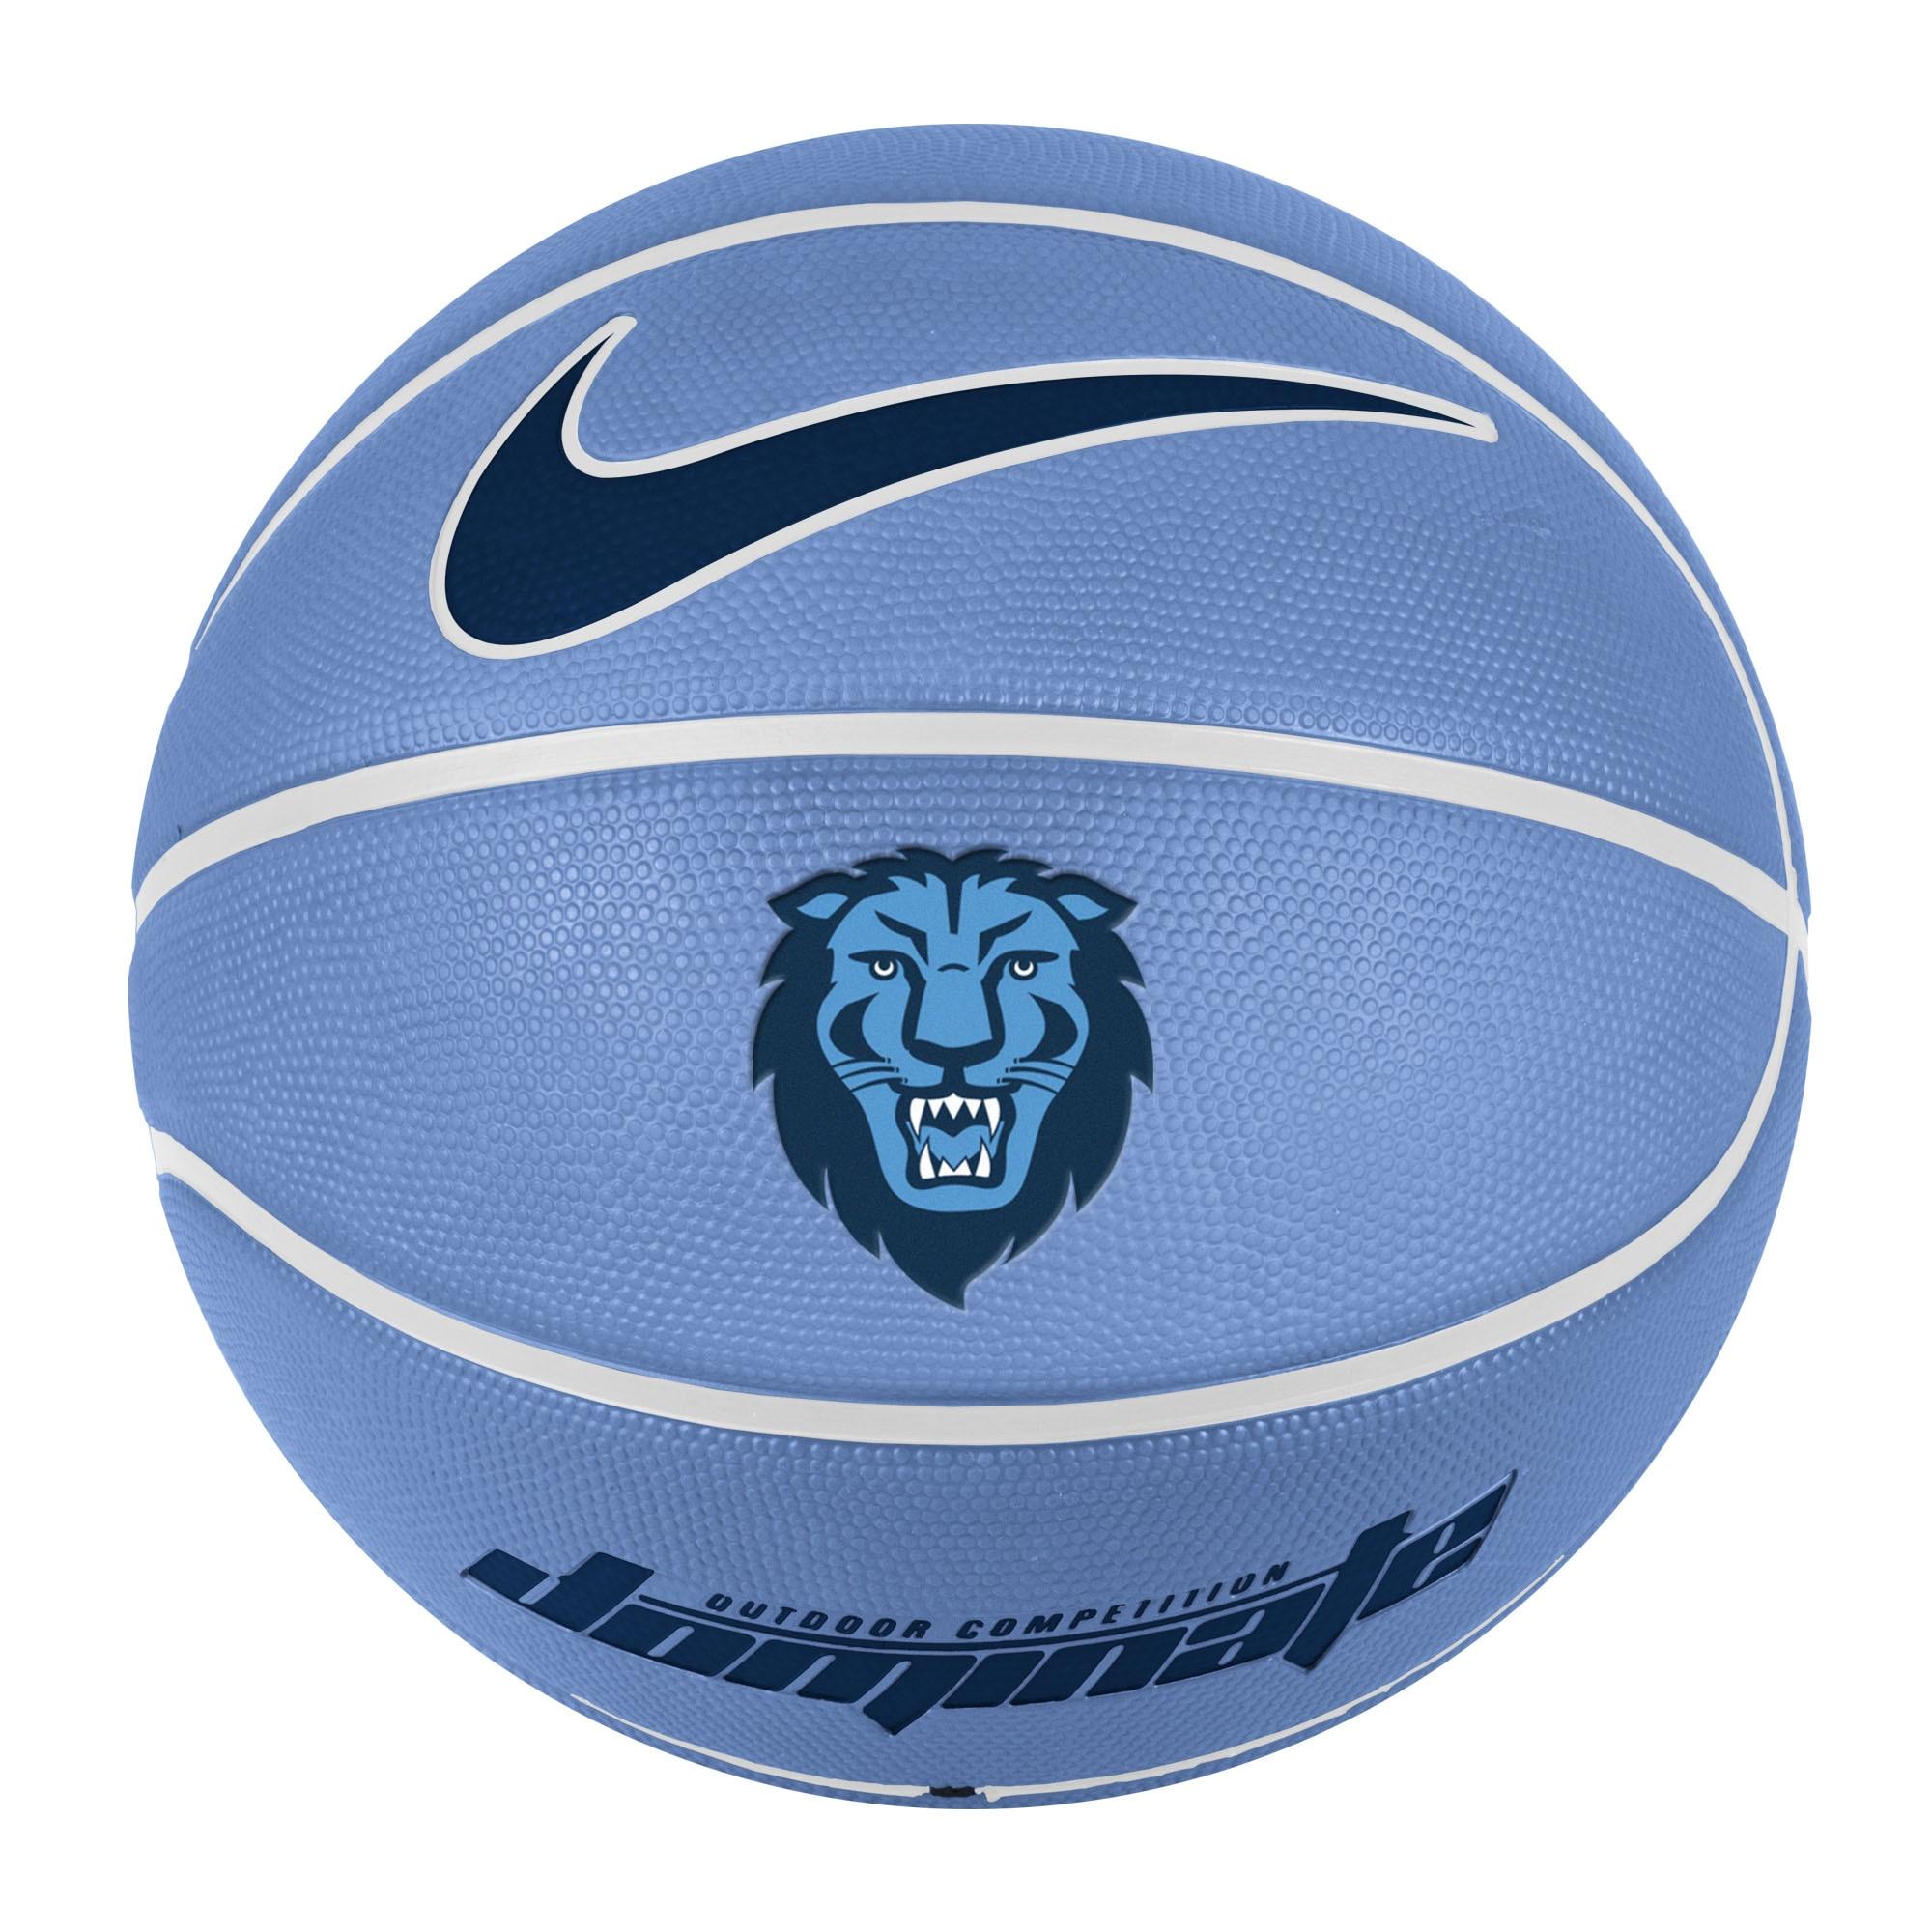 Columbia University Nike Full Size Rubber Basketball